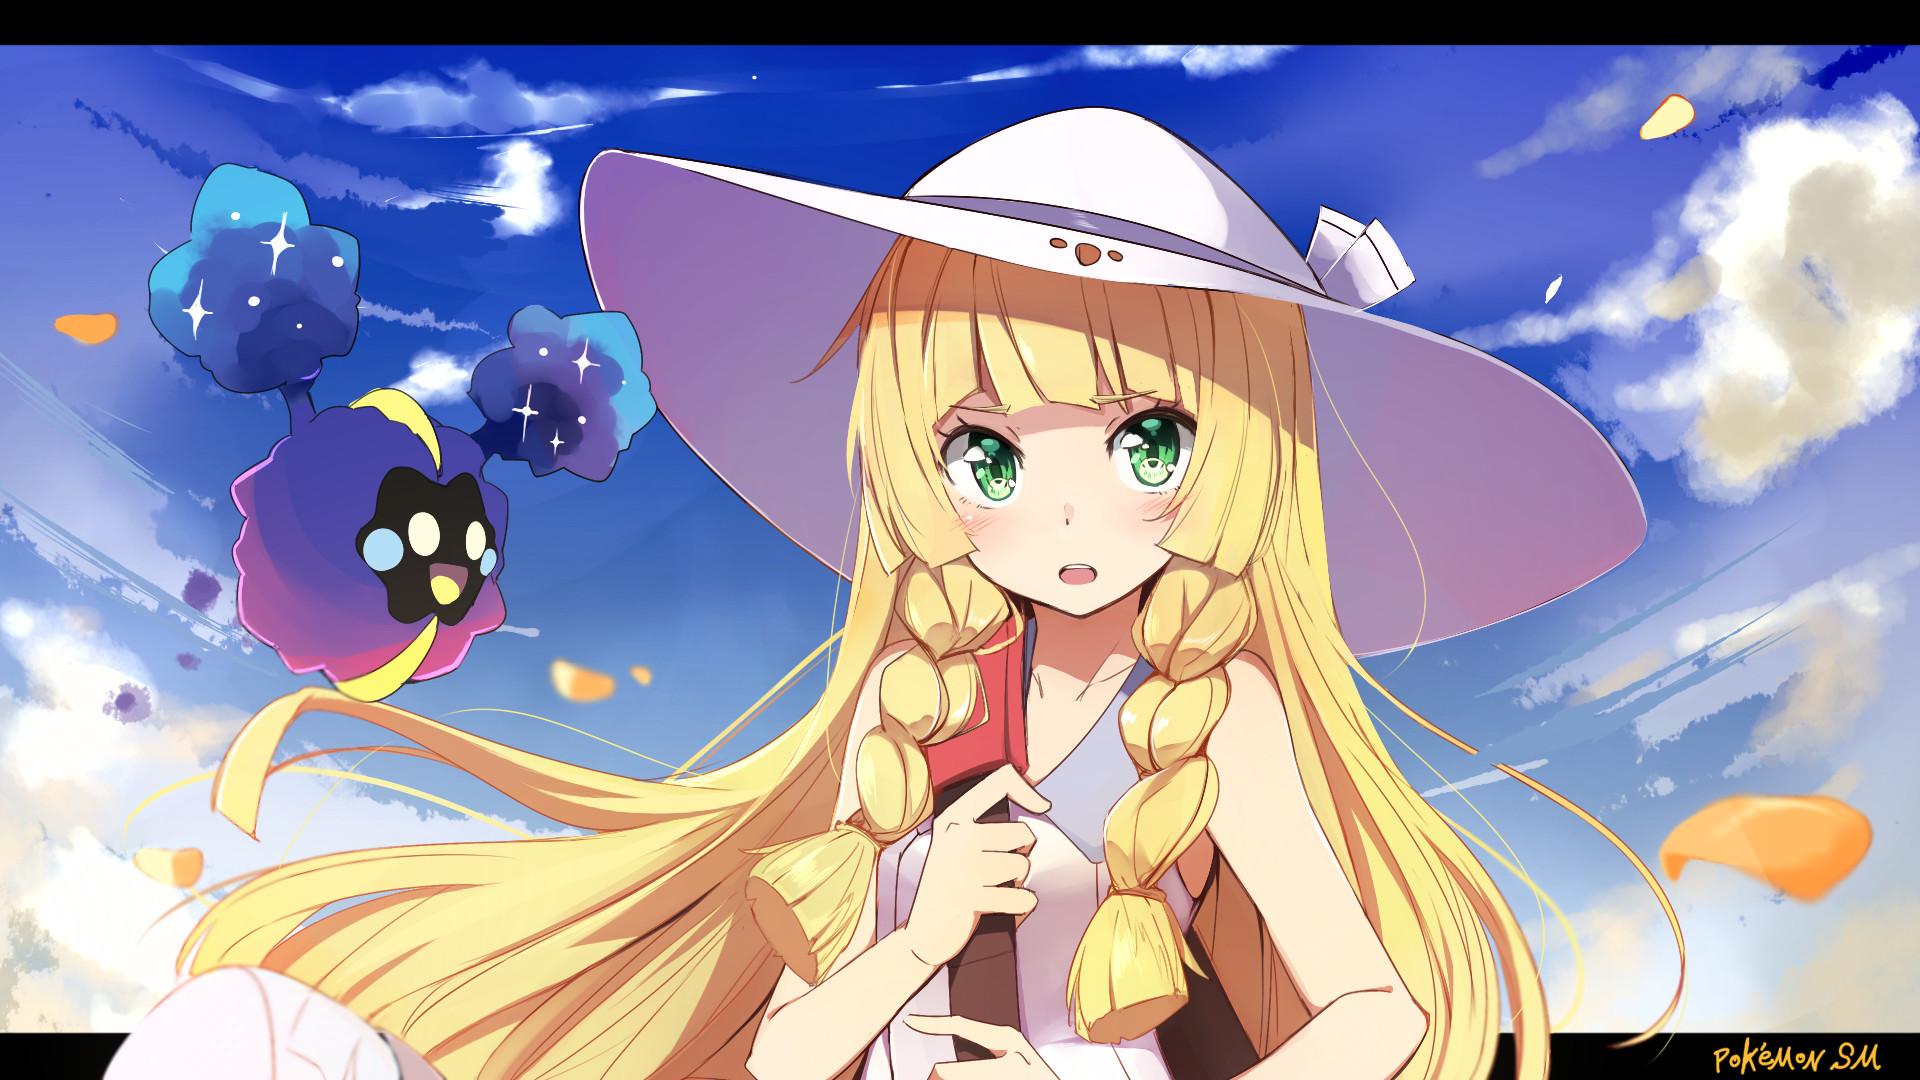 Video Game Pokémon Sun And Moon Lillie (Pokemon) Cosmog (Pokémon) Wallpaper